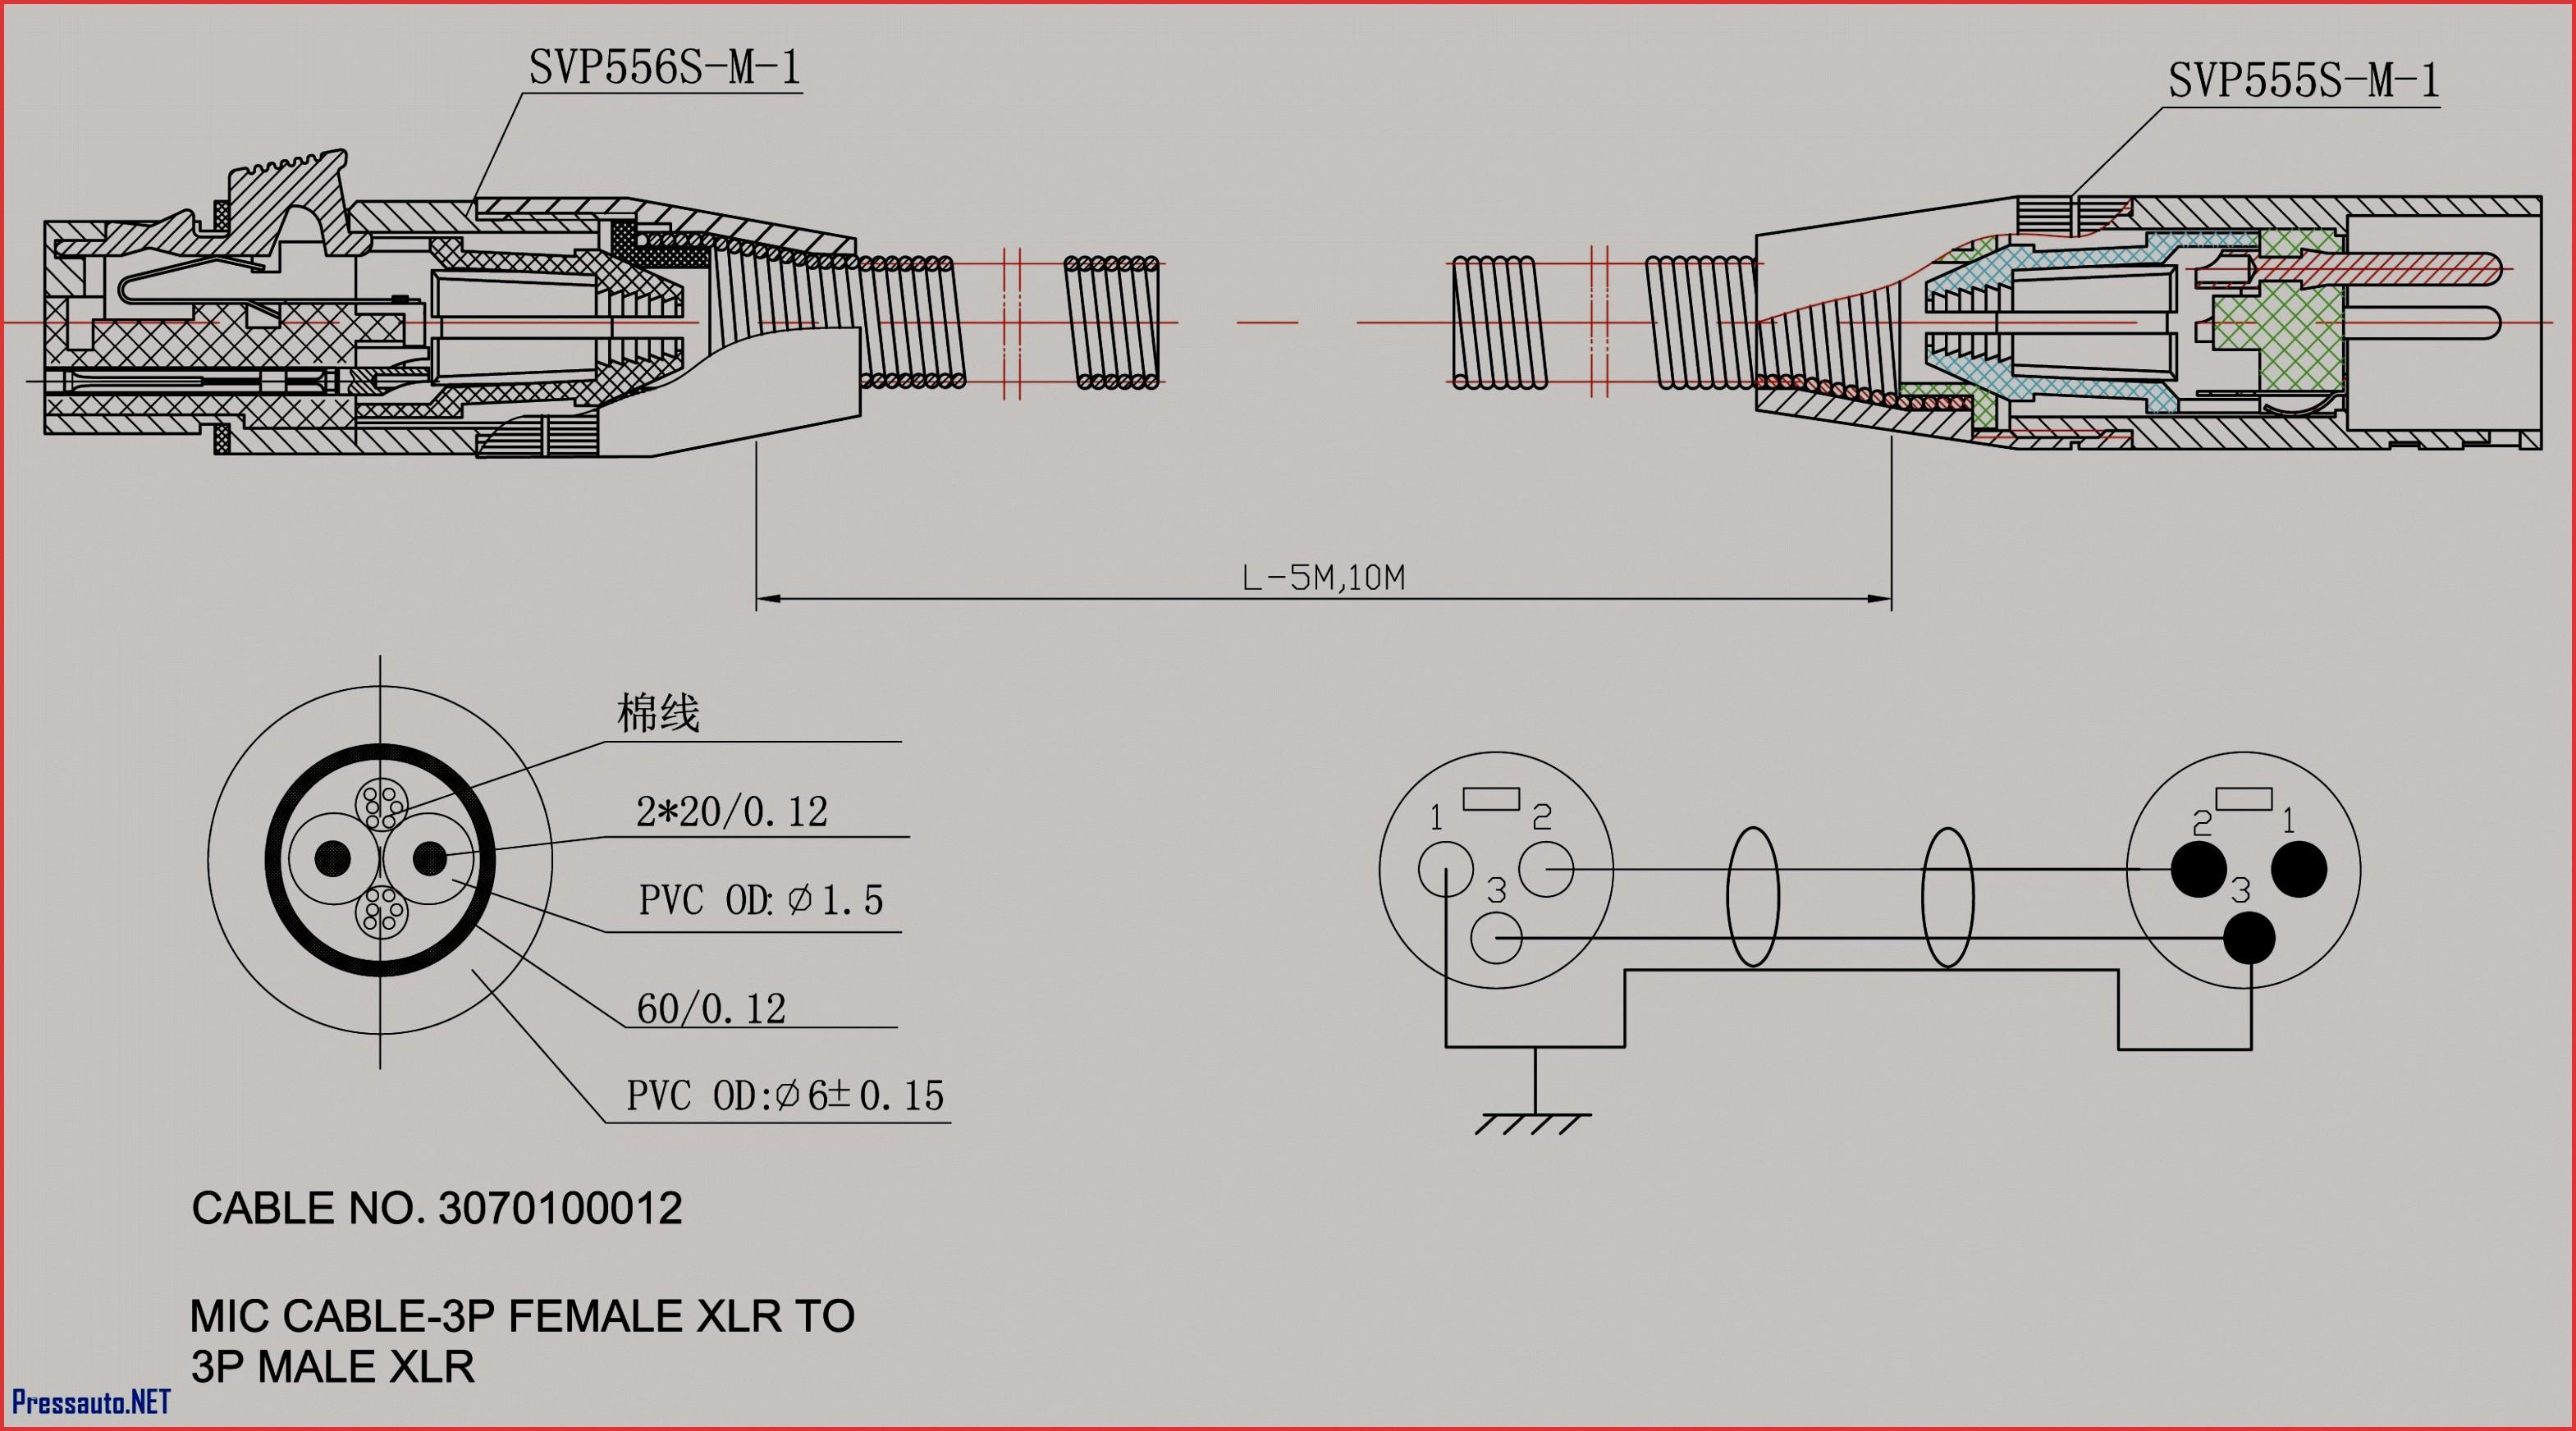 Atv Winch Wiring Diagram Ve 9742] Quadboss Winch solenoid Wiring Diagram Free Diagram Of Atv Winch Wiring Diagram